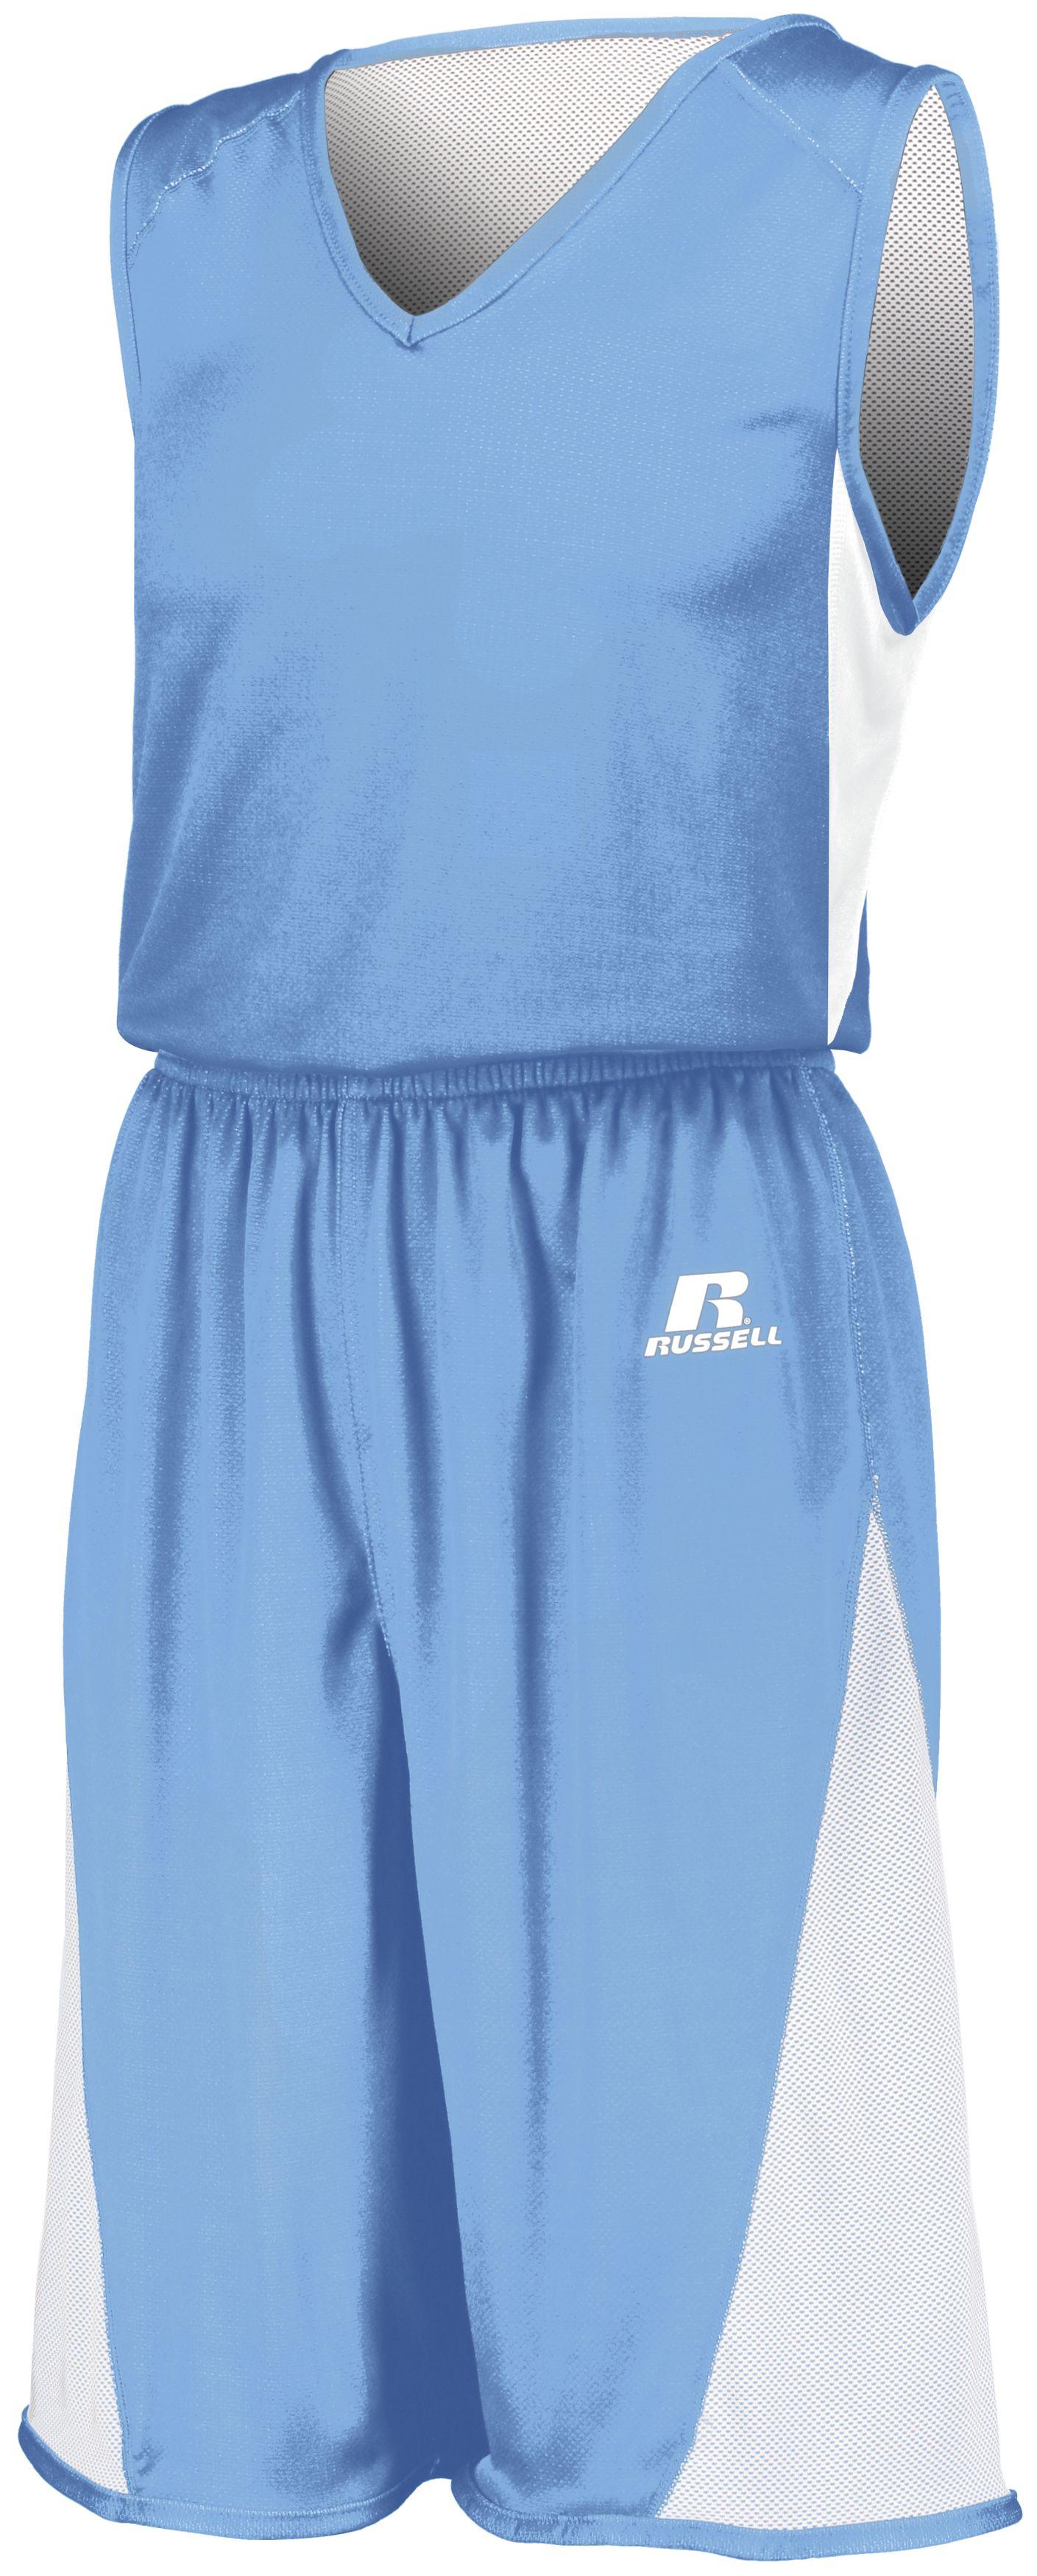 Undivided Single Ply Reversible Shorts - COLUMBIA BLUE/WHITE